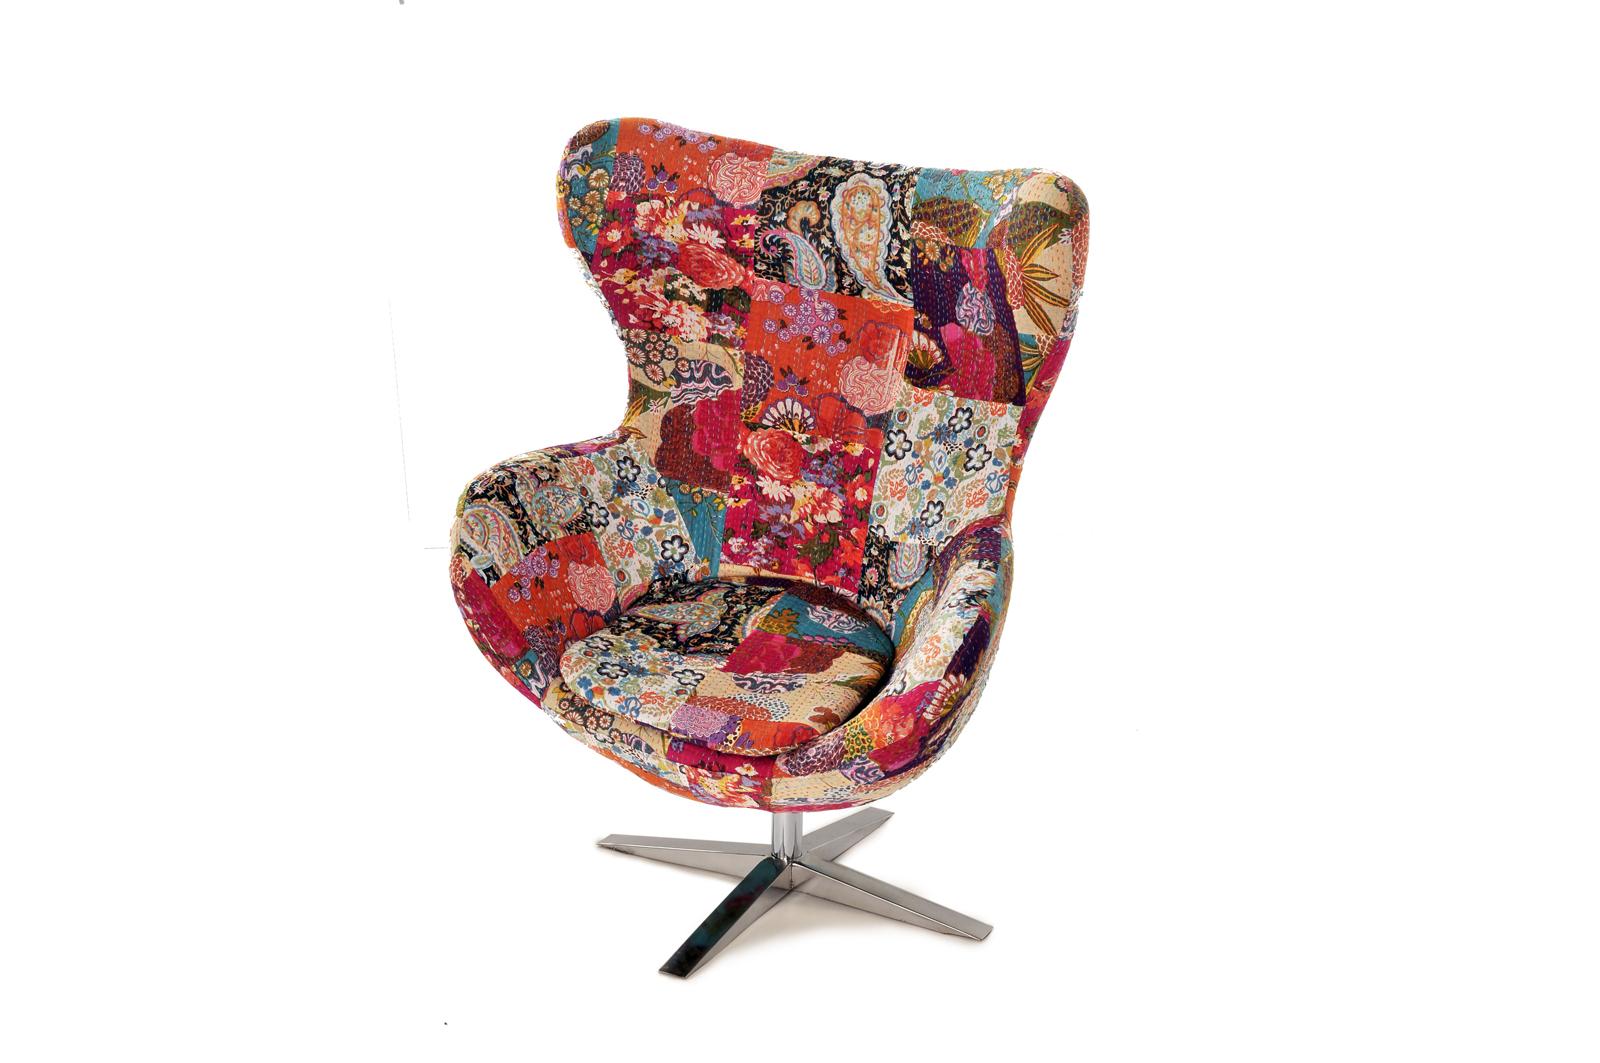 Sale ohrensessel edelstahlfu blumenmuster kamila for Designer badmobel sale